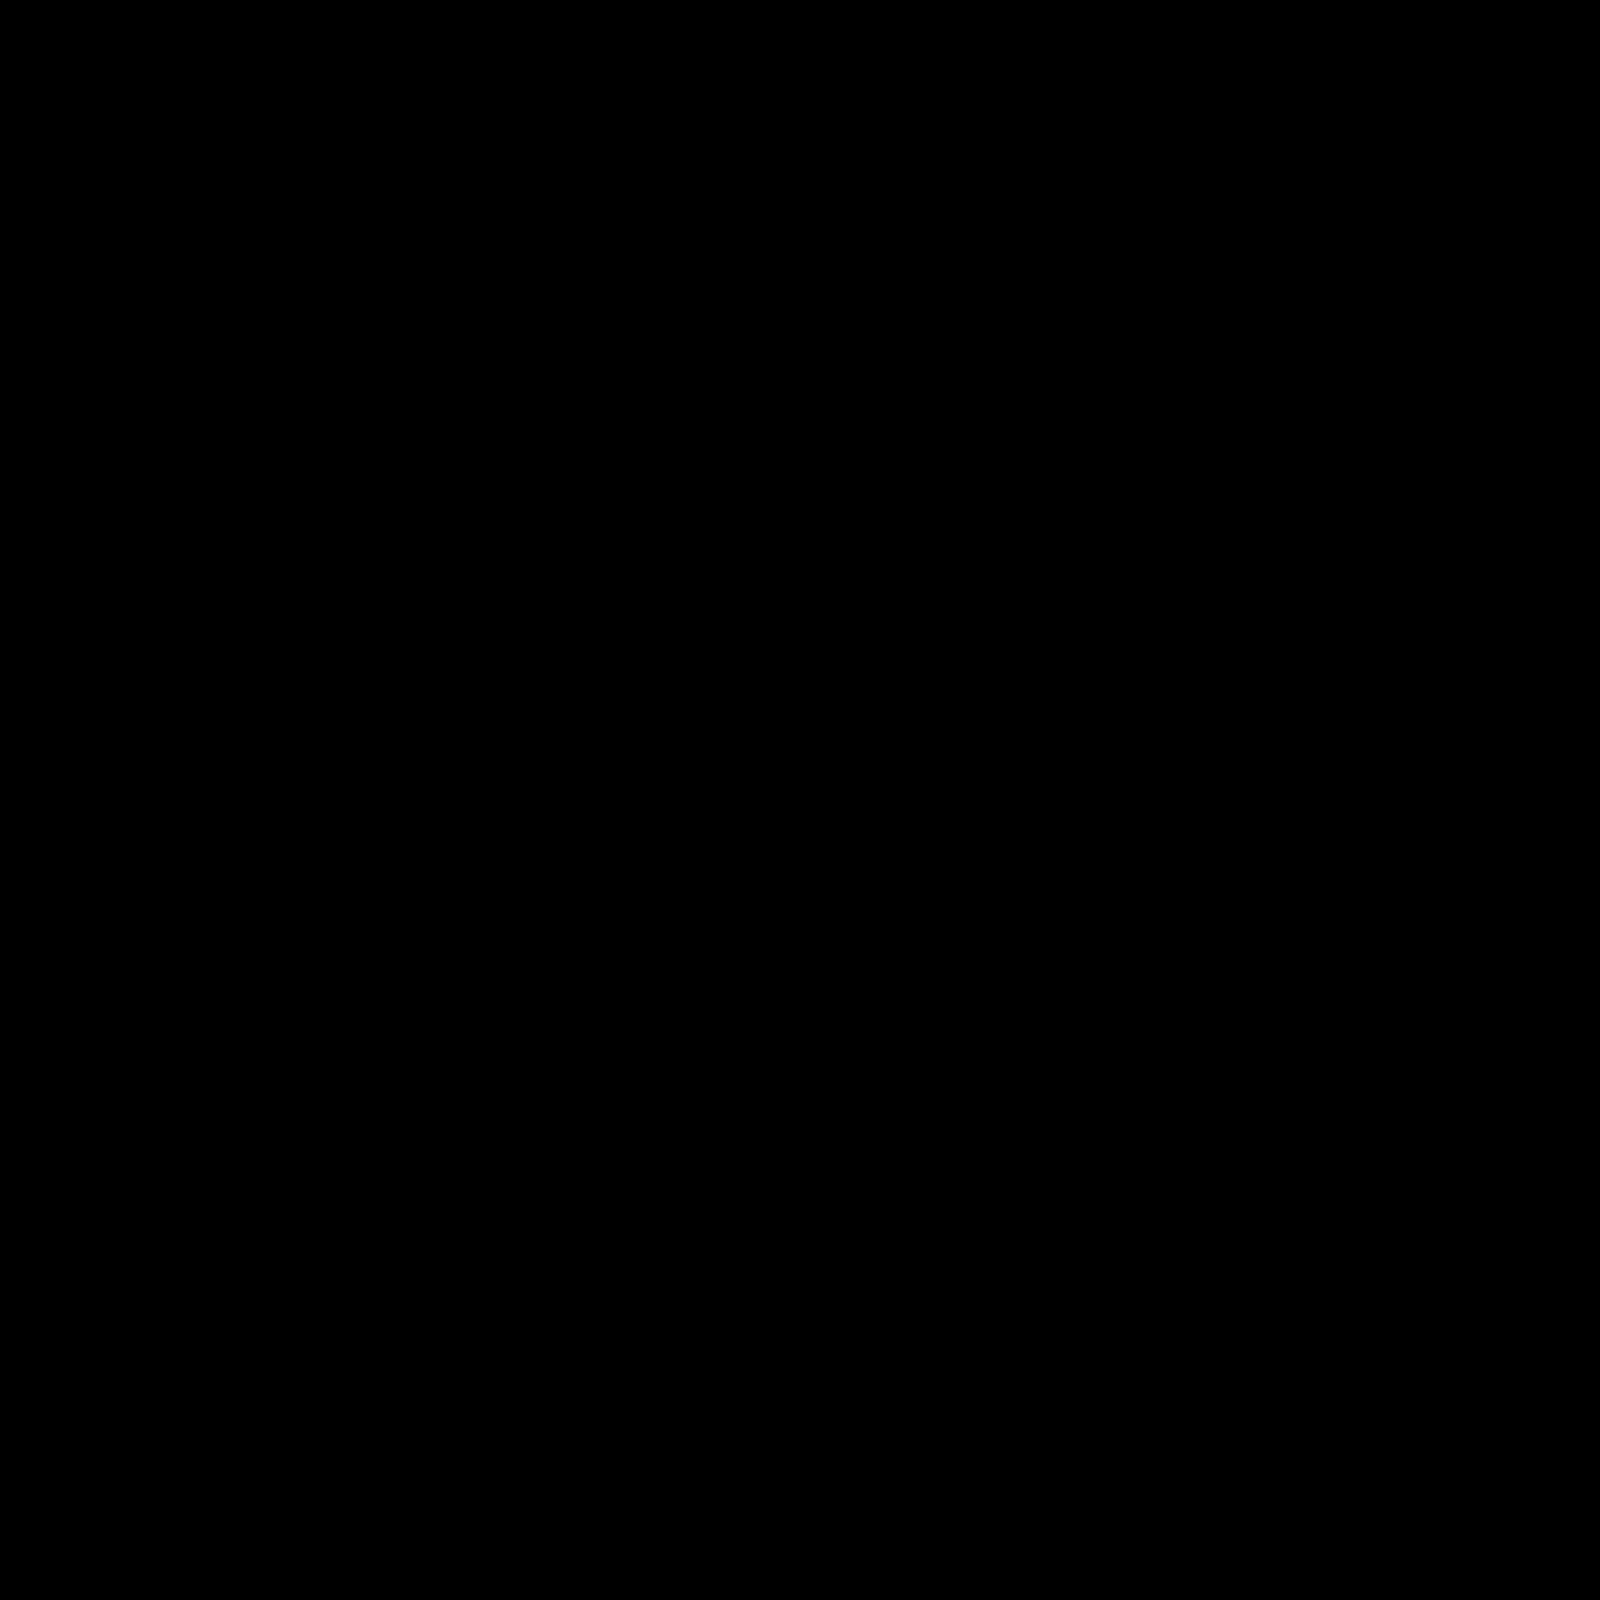 Empire icon